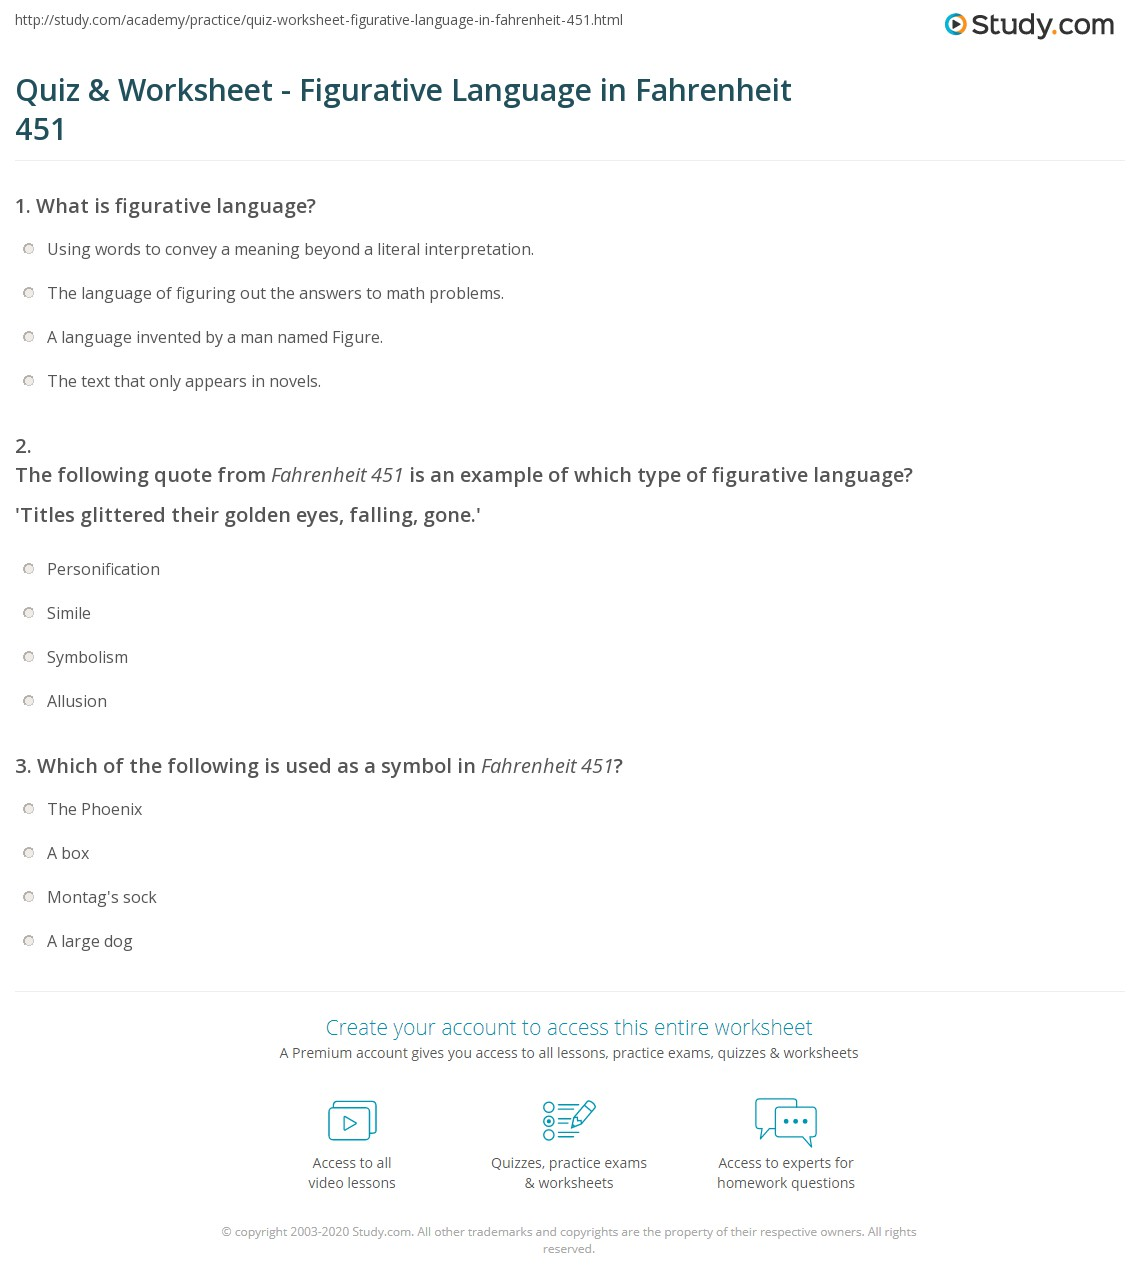 quiz worksheet figurative language in fahrenheit 451. Black Bedroom Furniture Sets. Home Design Ideas